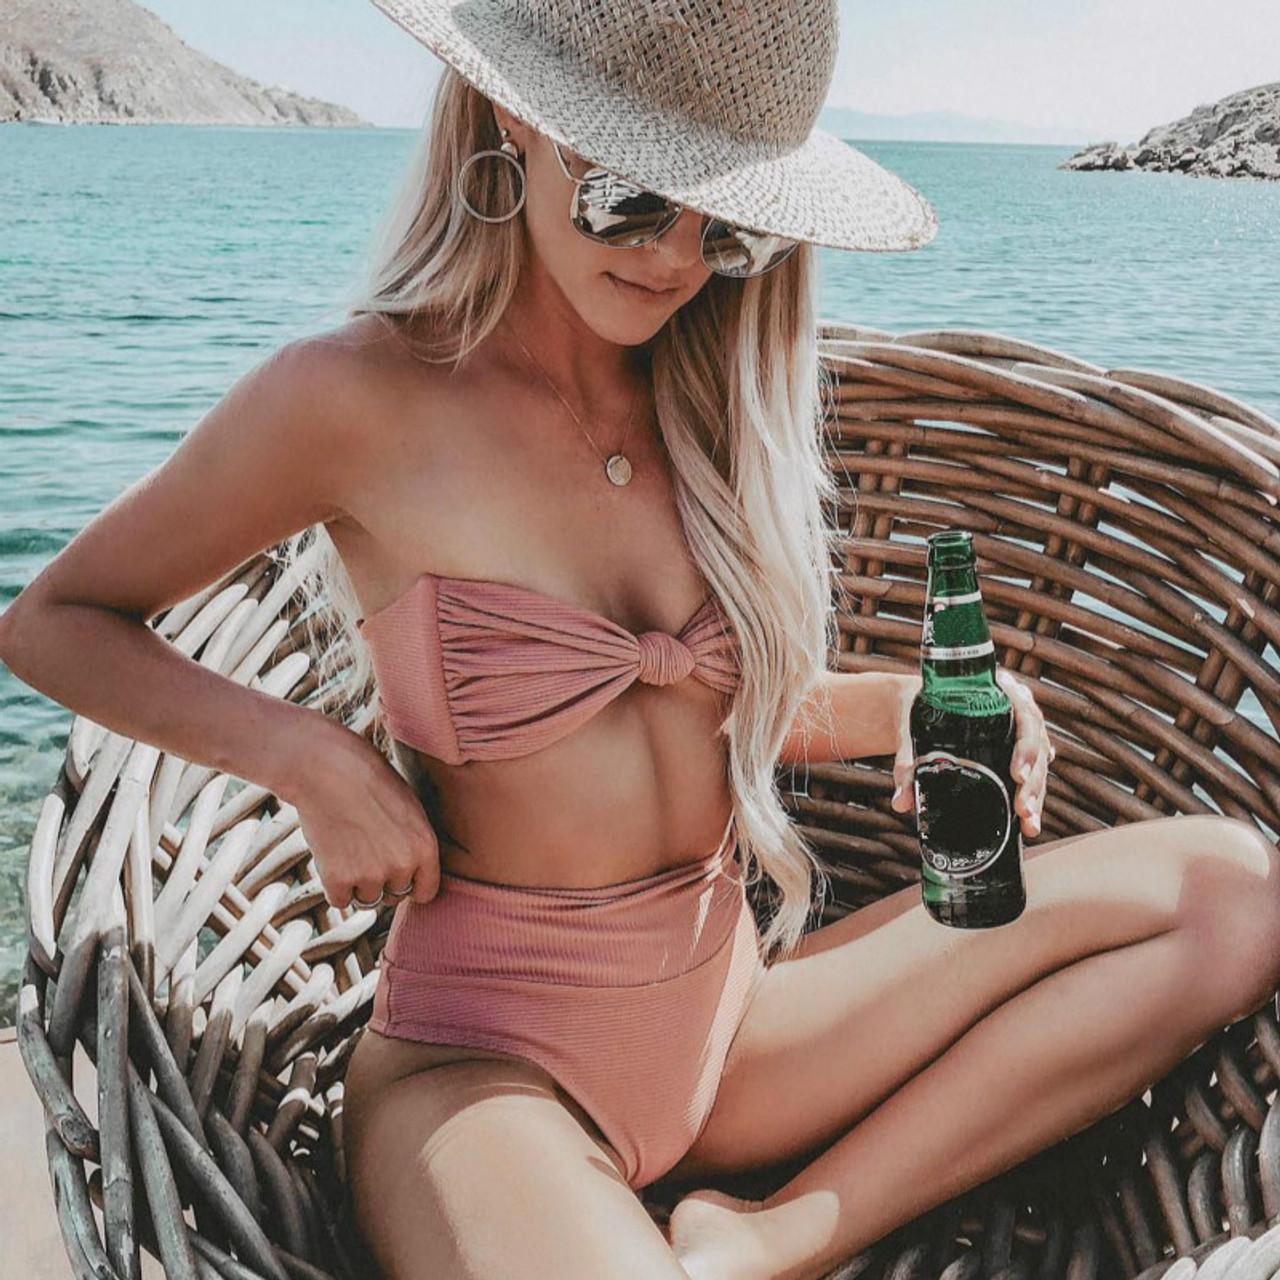 eb5306796a05f HOT Bikinis 2019 Mujer Tube Top Tie High Waisted Bikini Separate ...